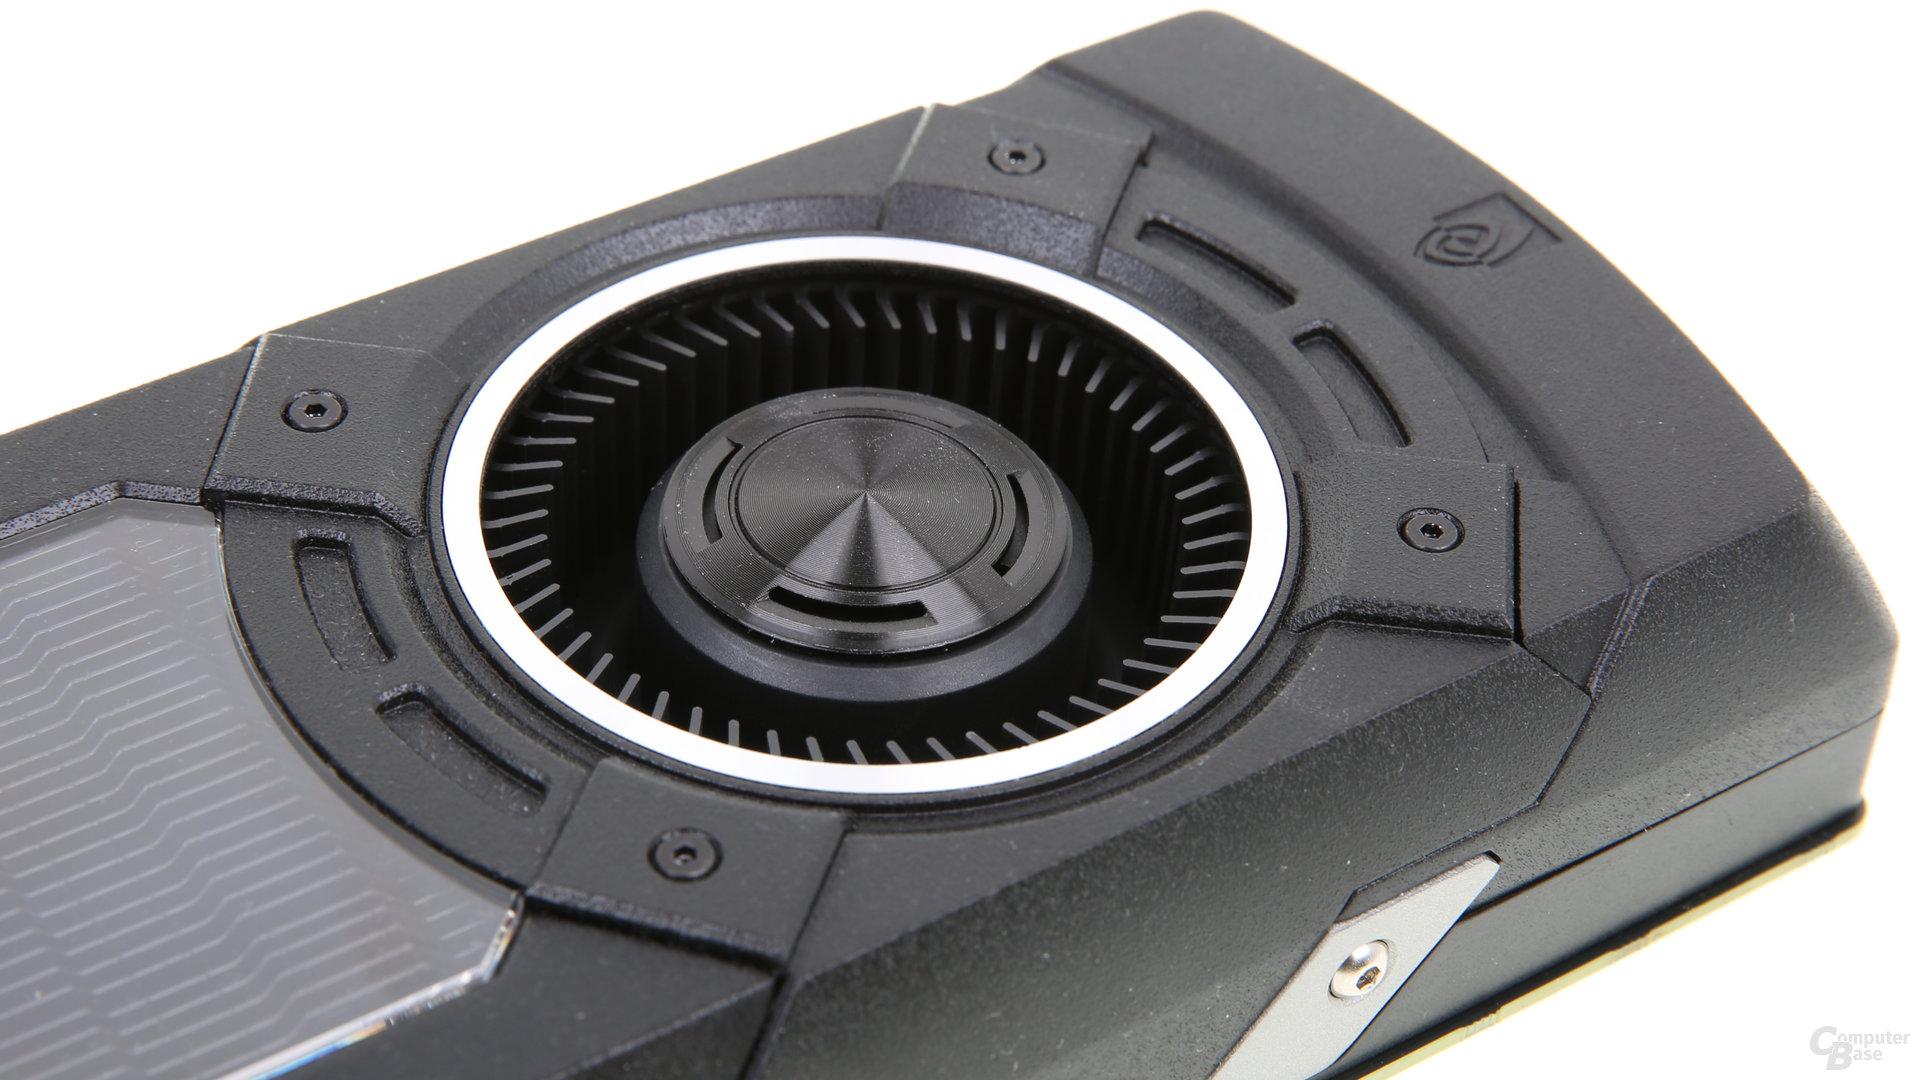 GeForce GTX Titan X - Lüfter